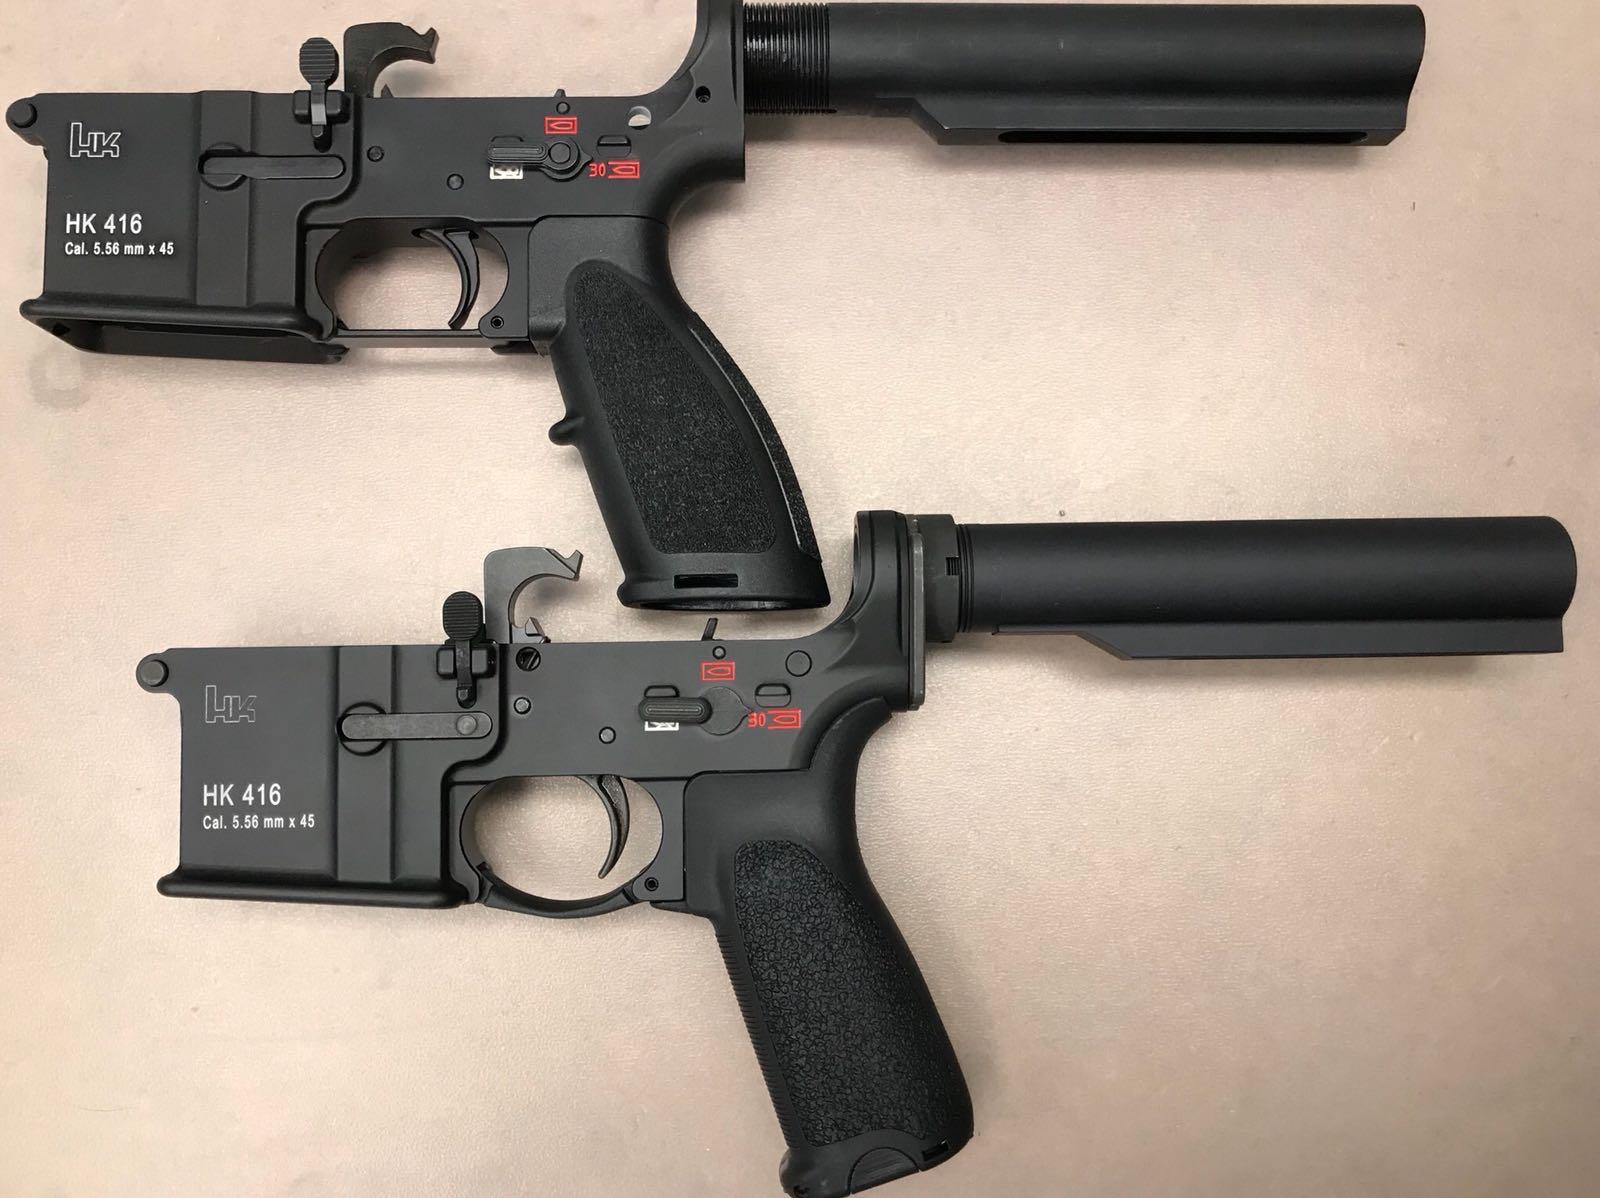 HK416 Owners Picture Thread (genuine HK416's only please)-hk416-pair-2018-06-23.jpg